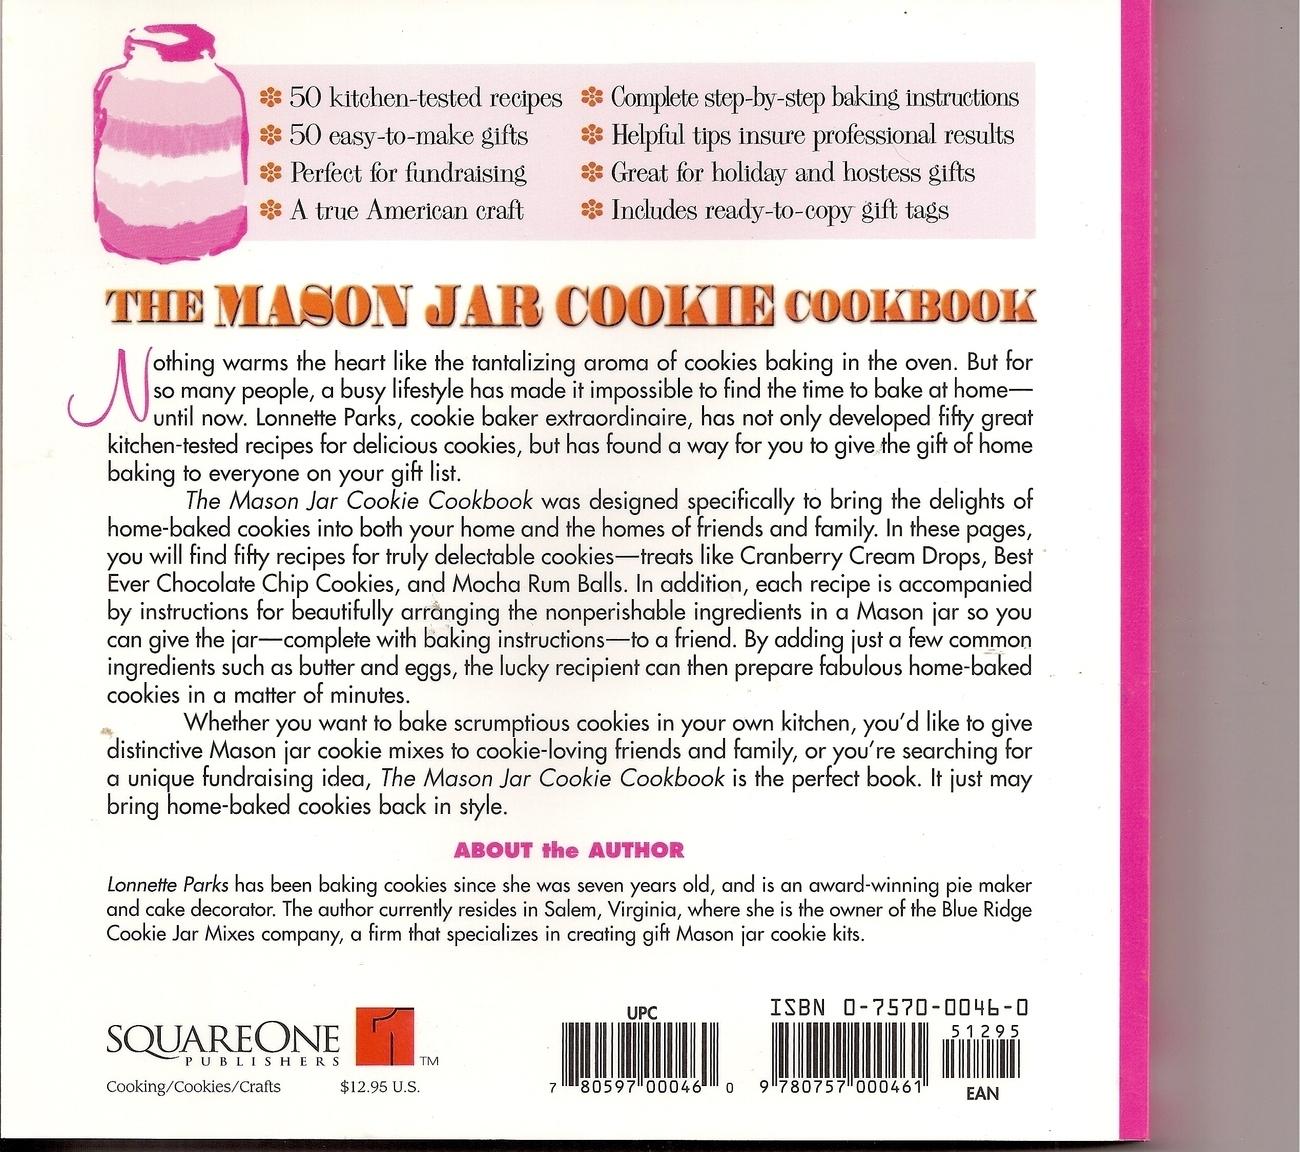 The Mason Jar Cookie Cookbook by Lonnette Parks